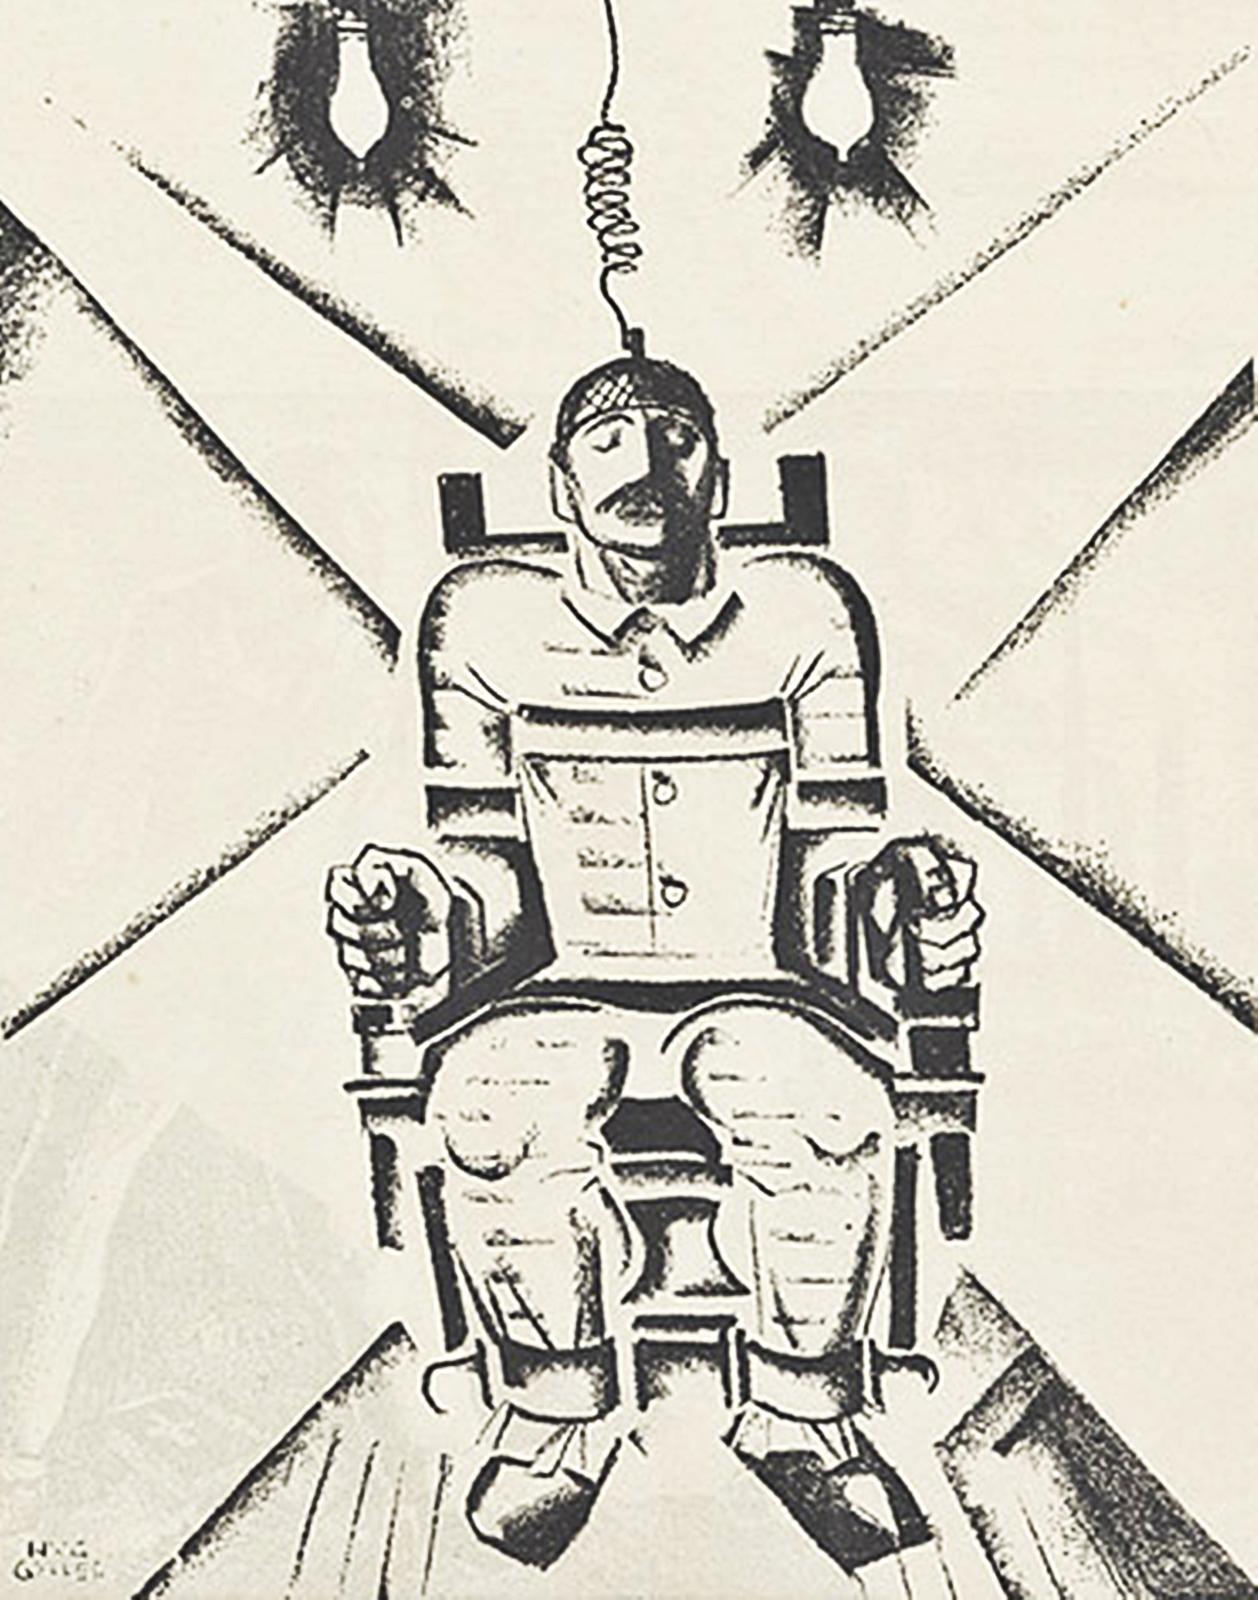 Mo t saiques 2 p 175 23 ao t 1927 sacco et vanzetti - Execution chaise electrique video ...